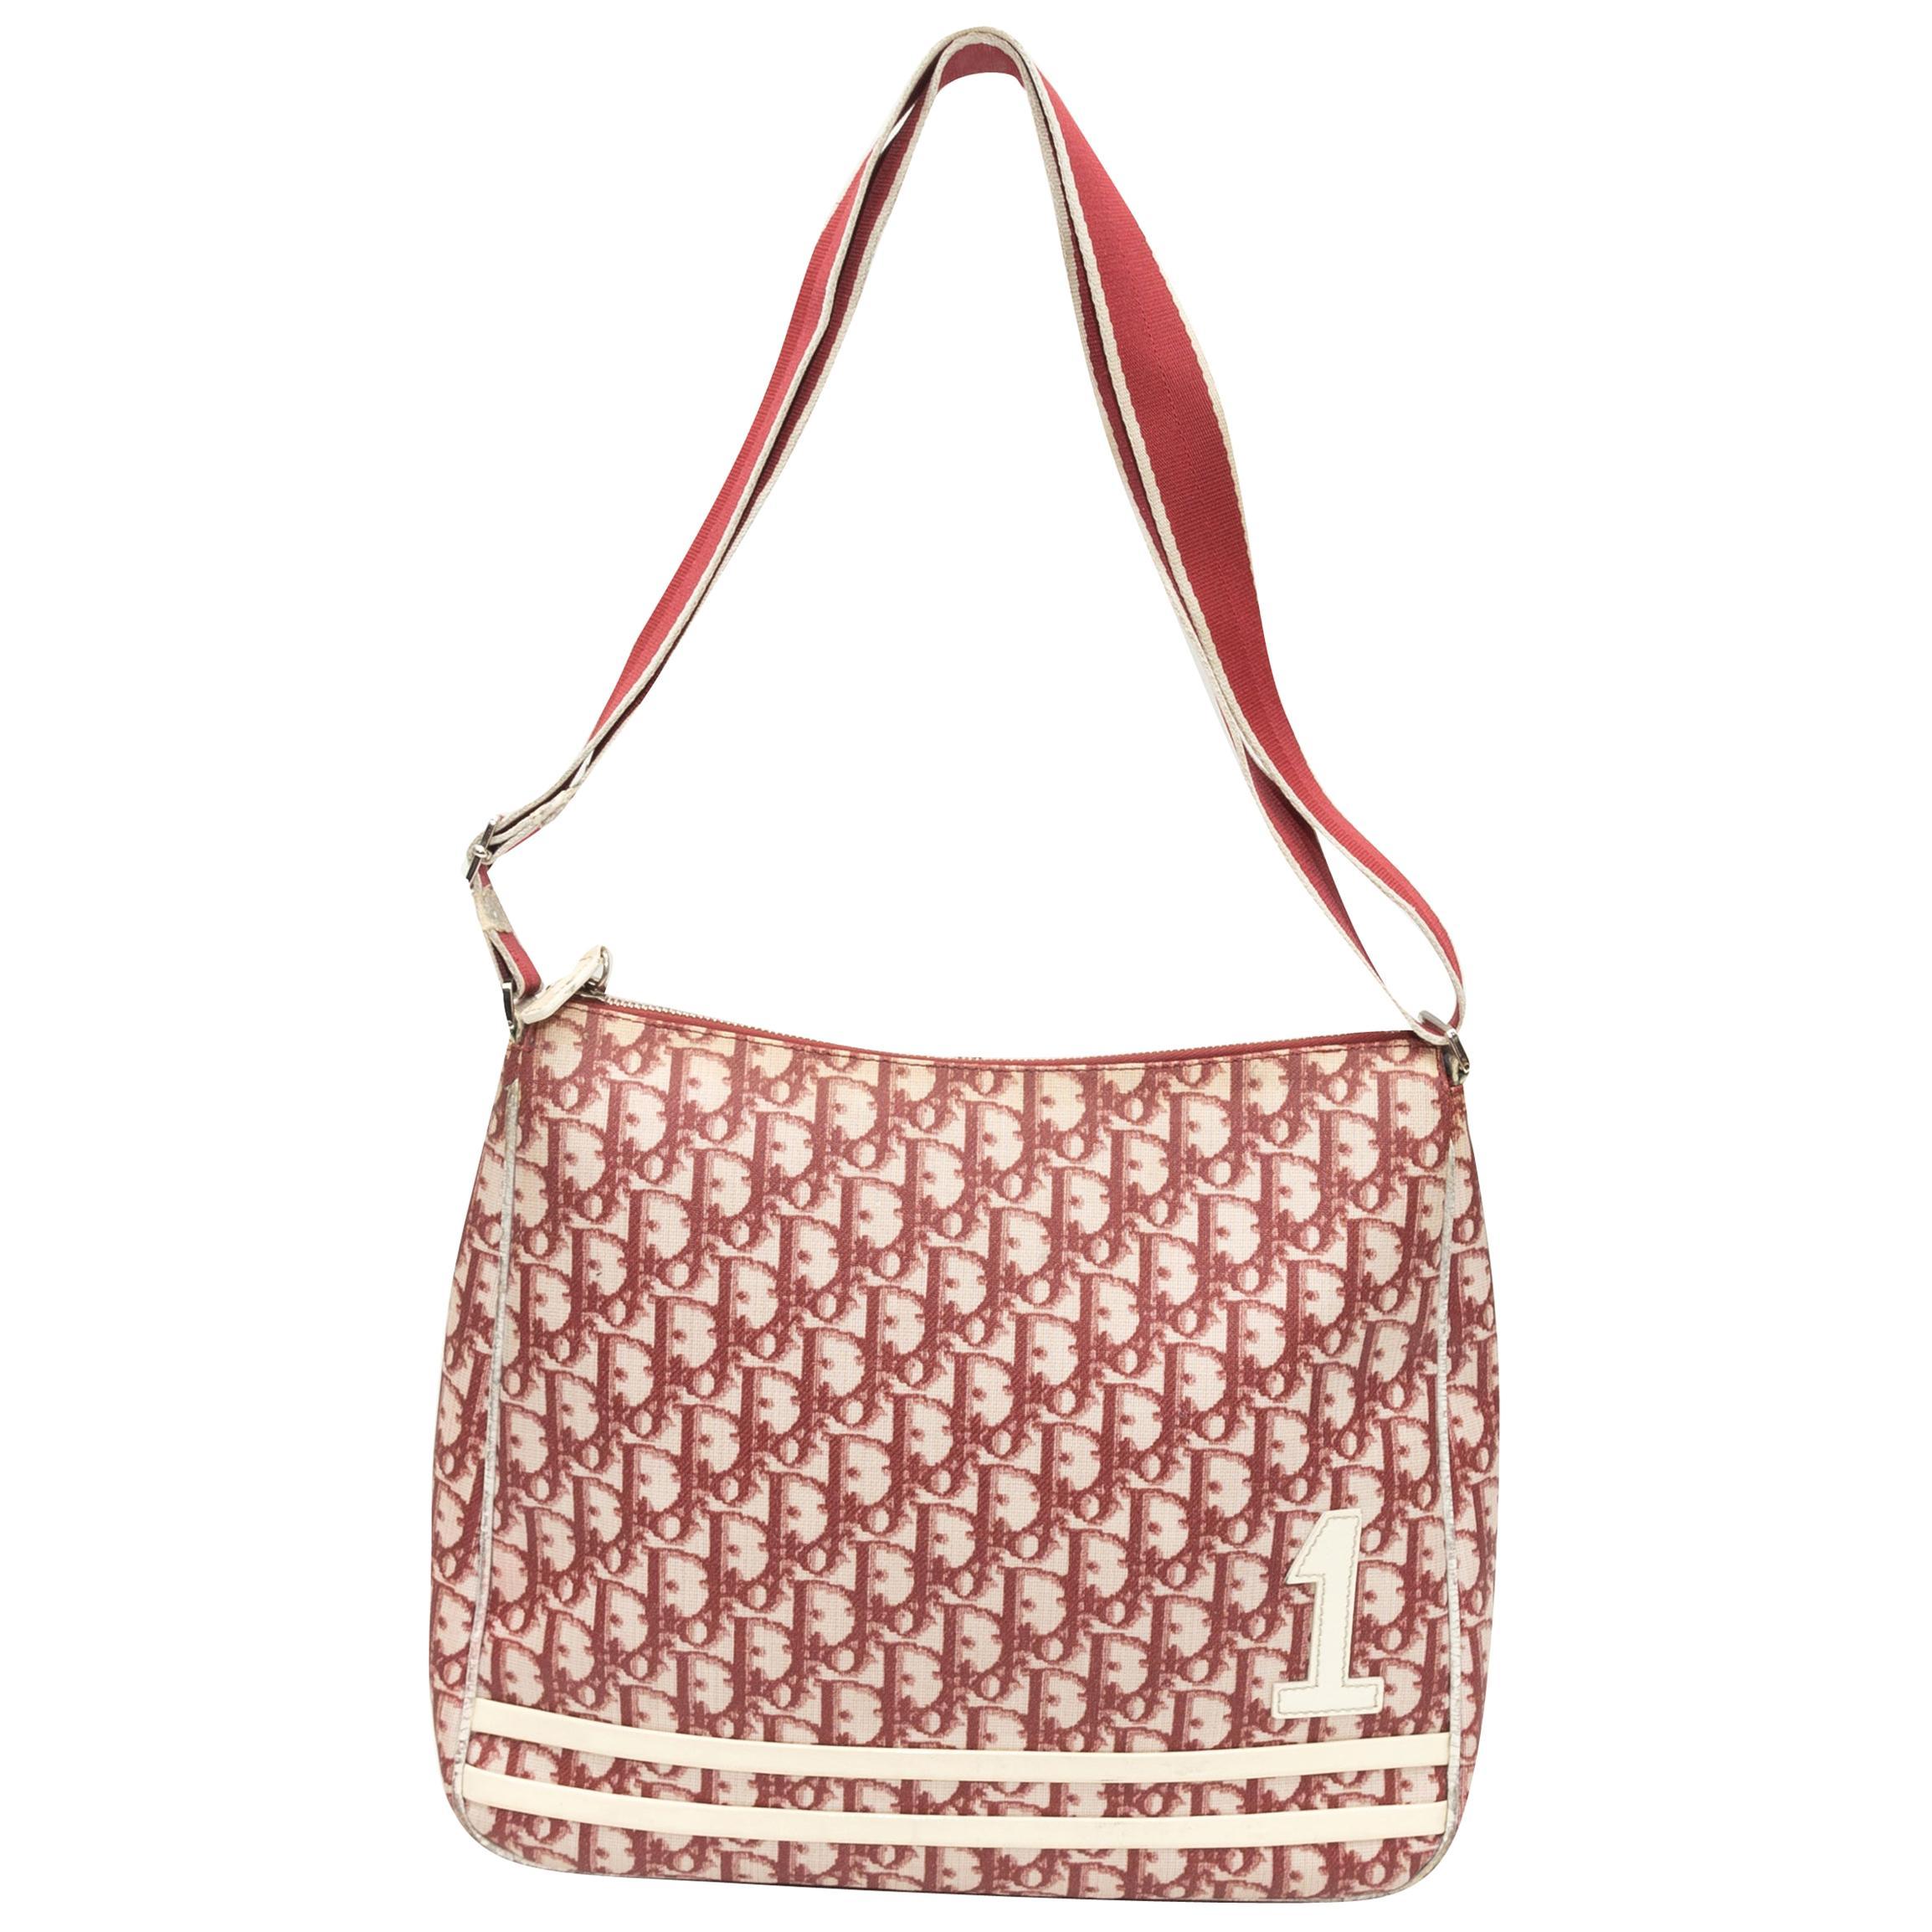 Christian Dior Red & White 2004 Oblique Trotter Messenger Bag